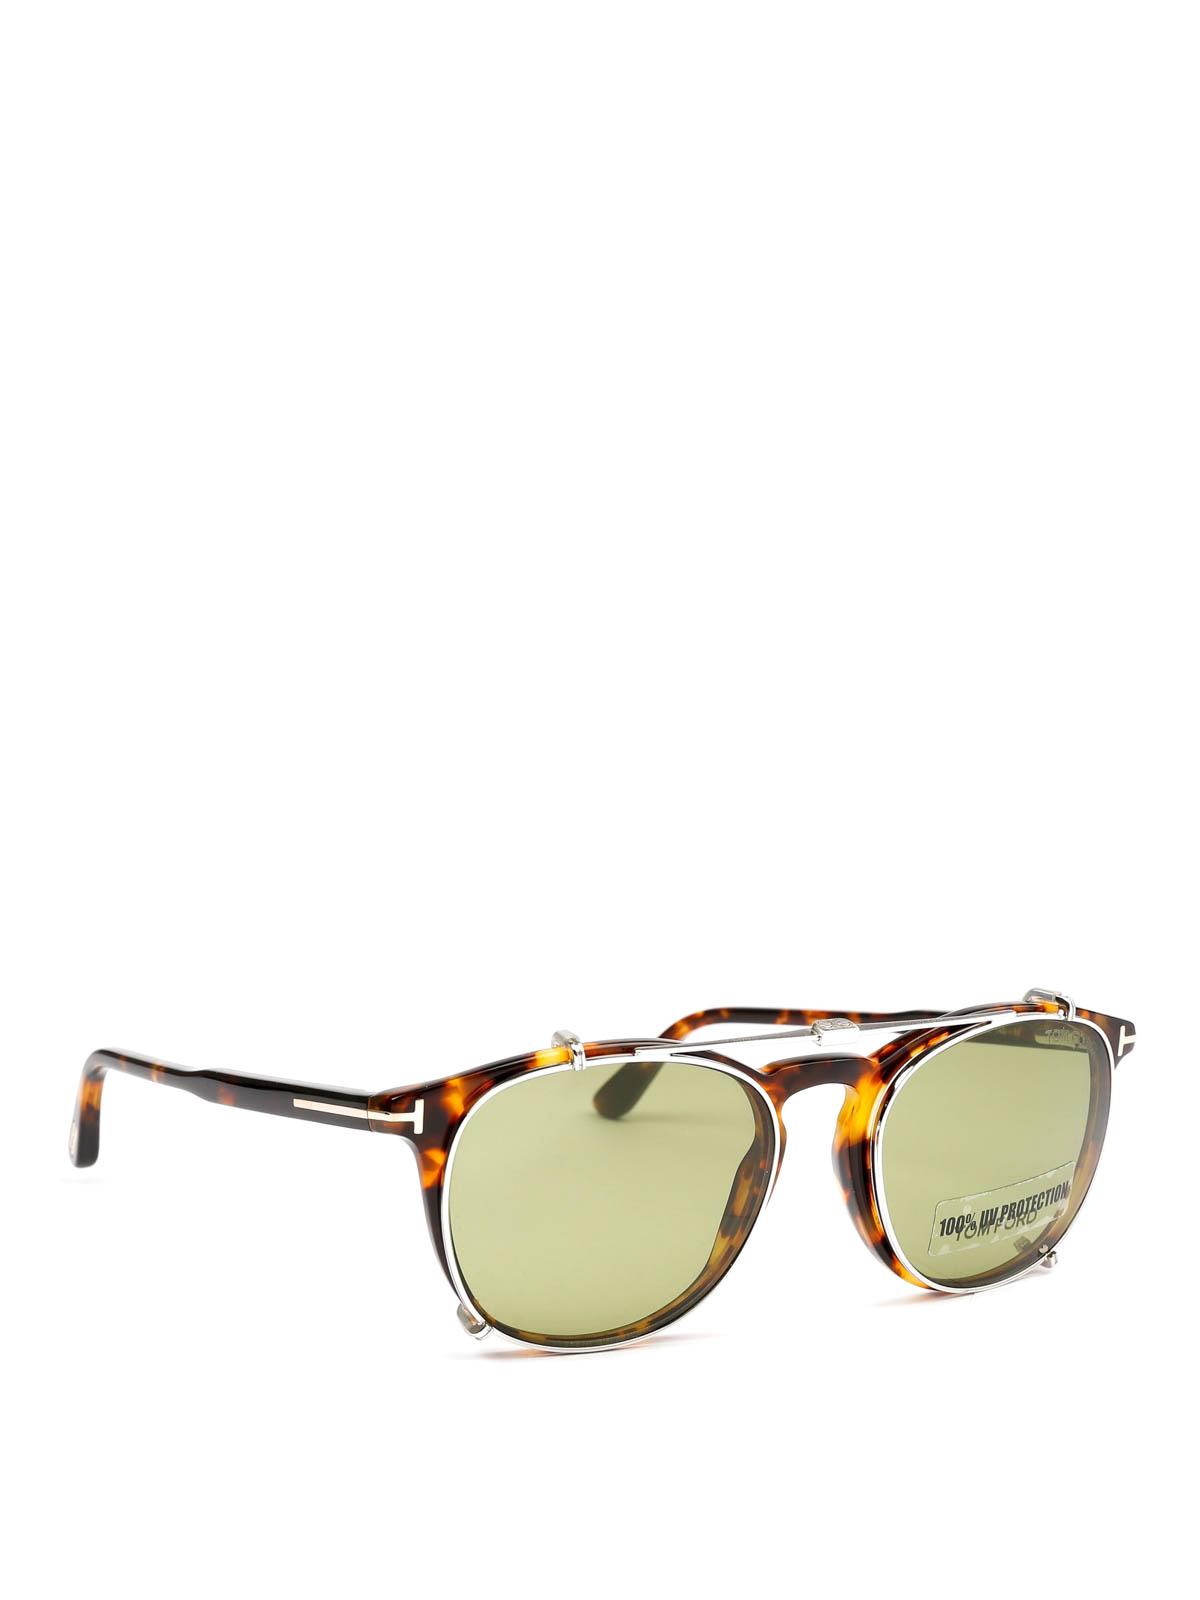 9c69b8c6b4 TOM FORD  sunglasses online - Clip On sunglasses with green lenses